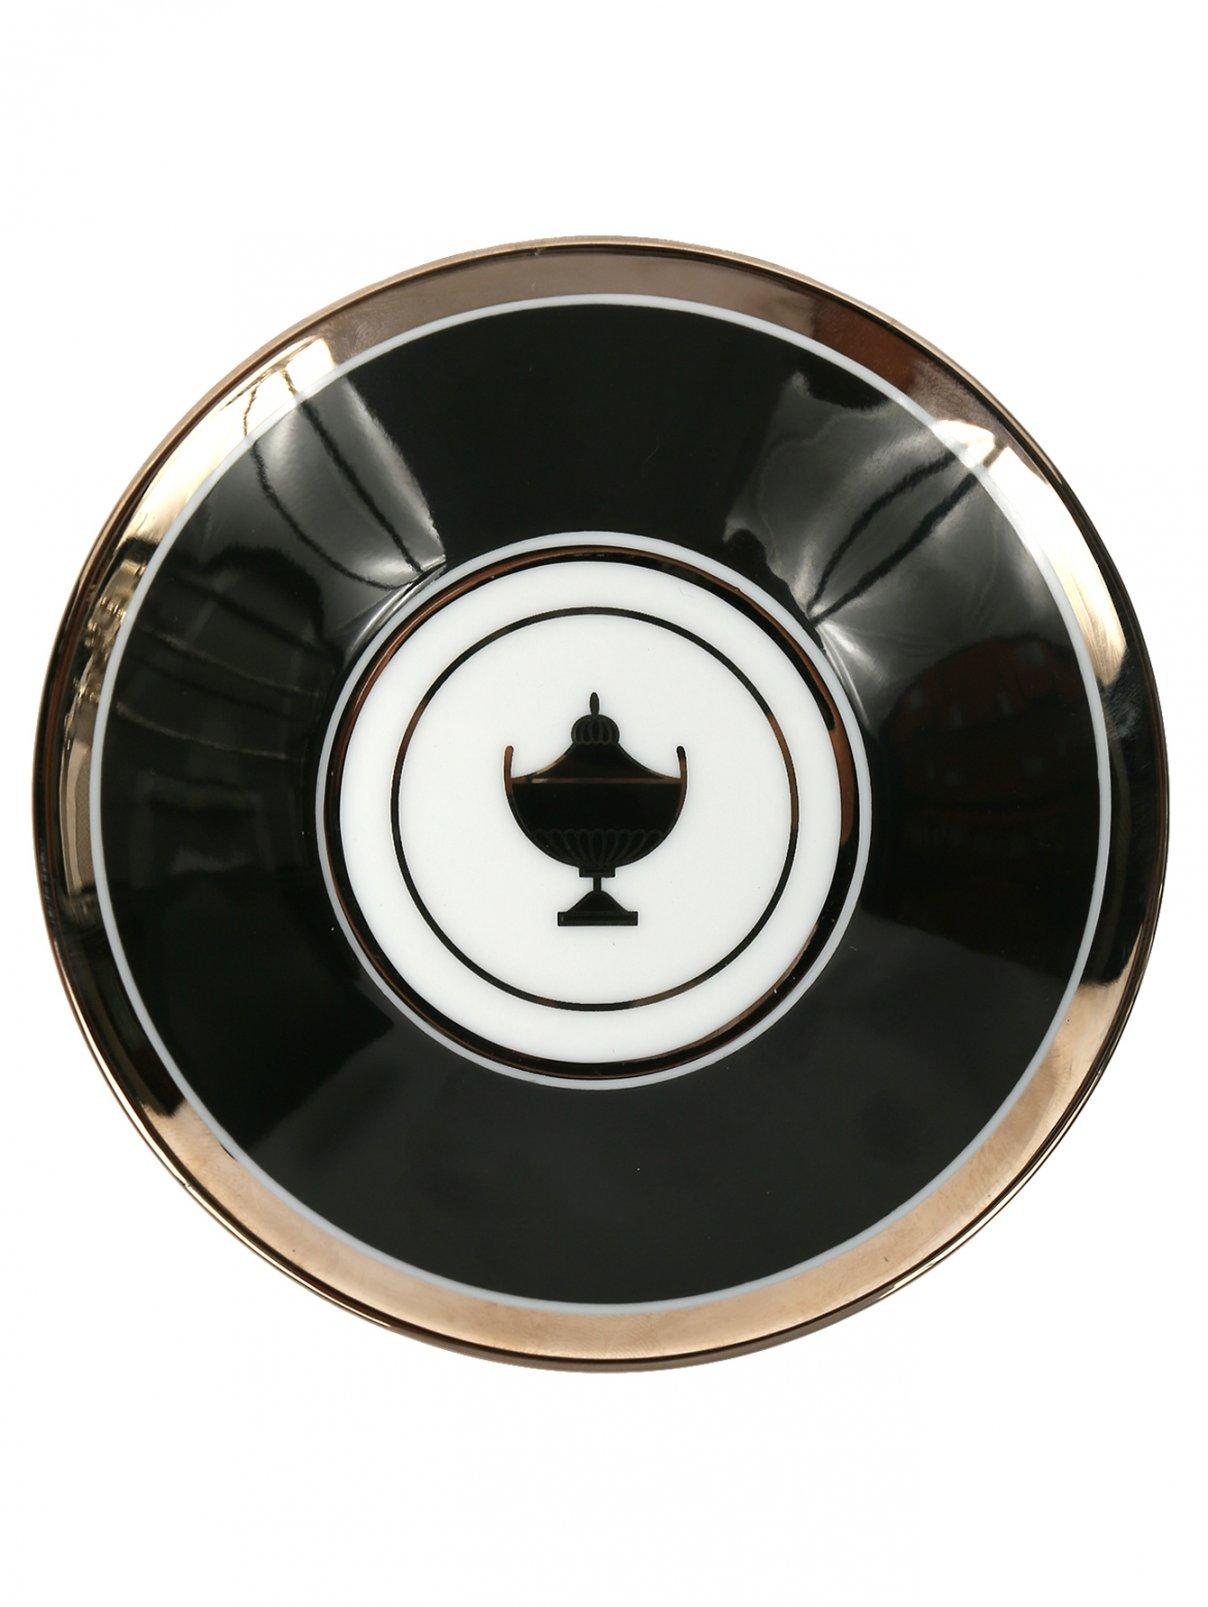 Блюдце кофейное Richard Ginori 1735  –  Общий вид